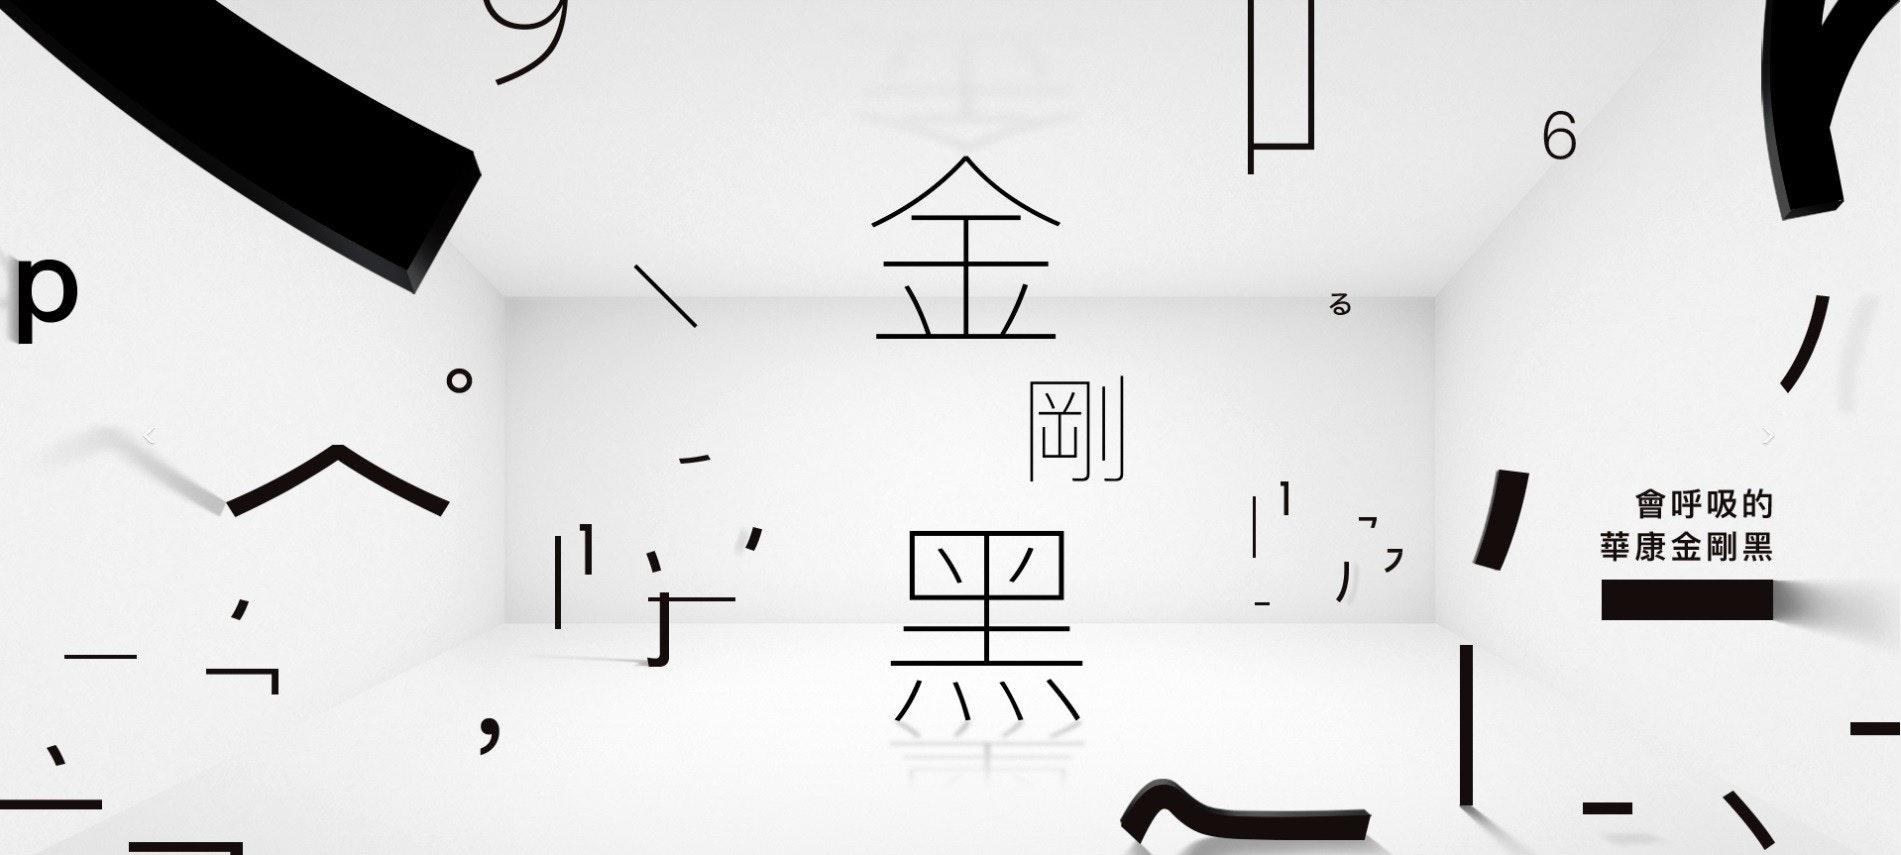 Product design, Graphic design, Brand, Product, Font, Design, Pattern, Clock, Technology, Angle, clock, white, black and white, text, font, clock, product, design, diagram, monochrome, line